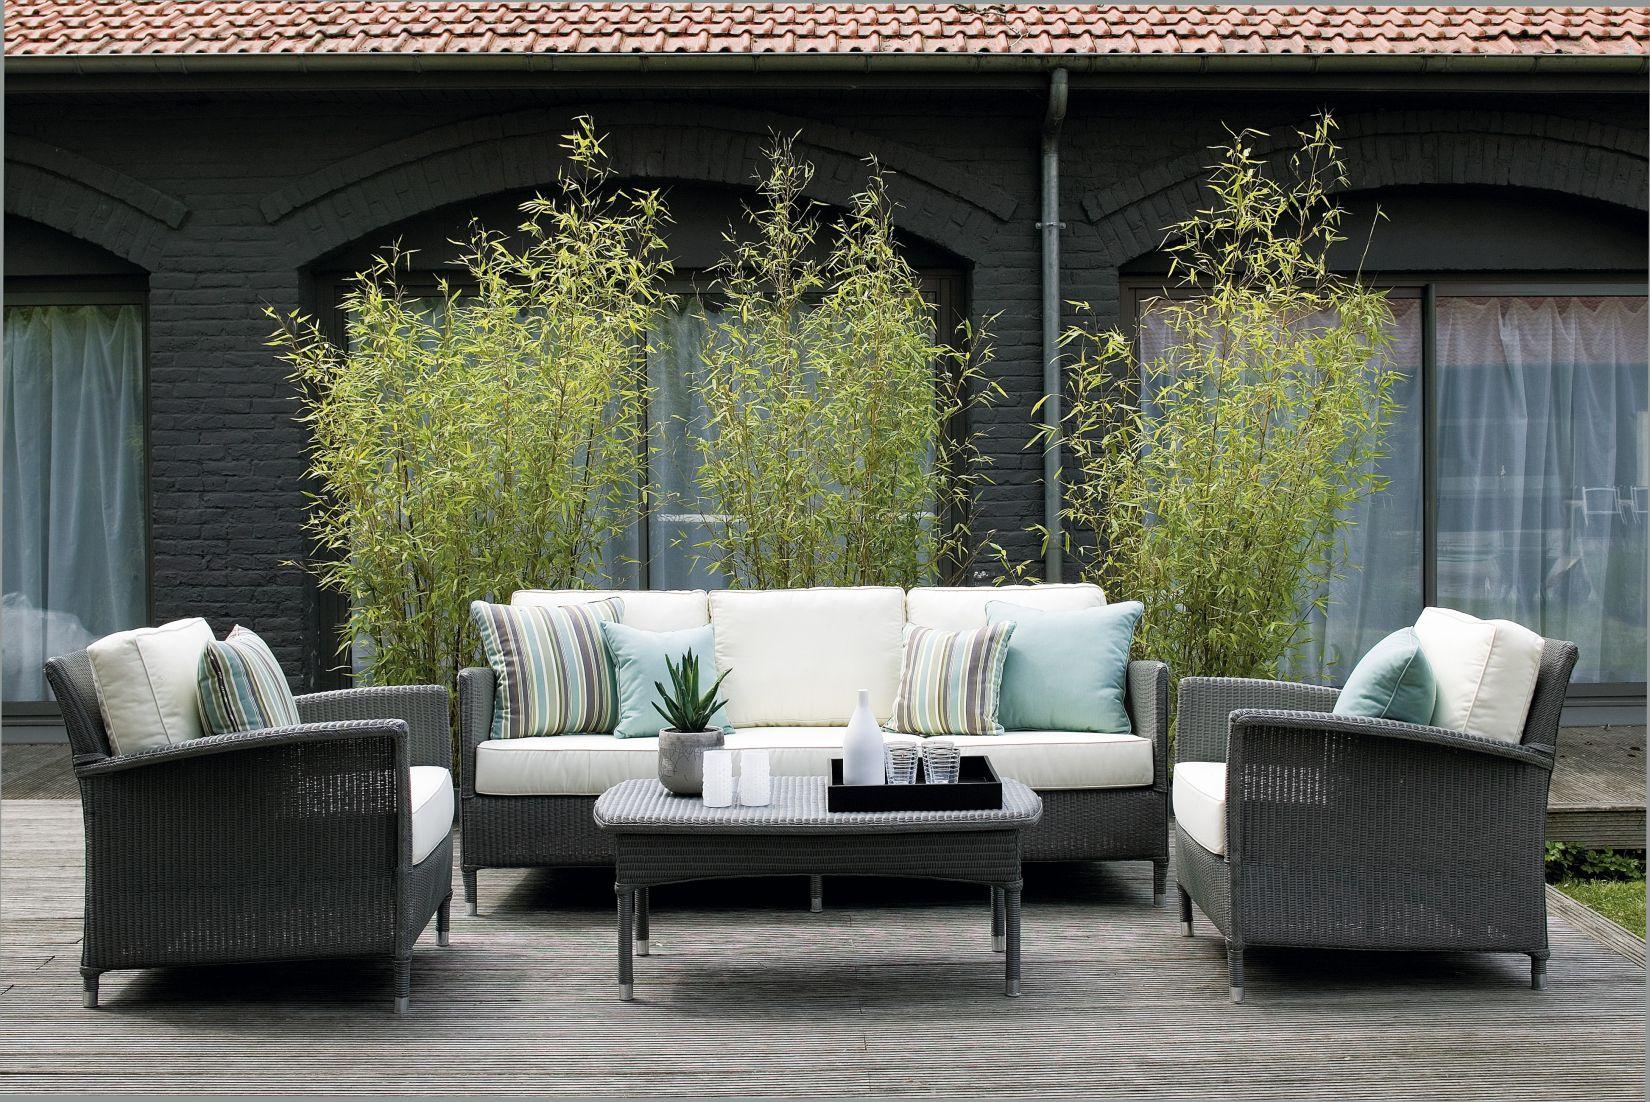 Vincent Sheppard Garten Dreisitzer Deauville Bei Villatmo.de | VILLATMO   Designer  Möbel, Lampen